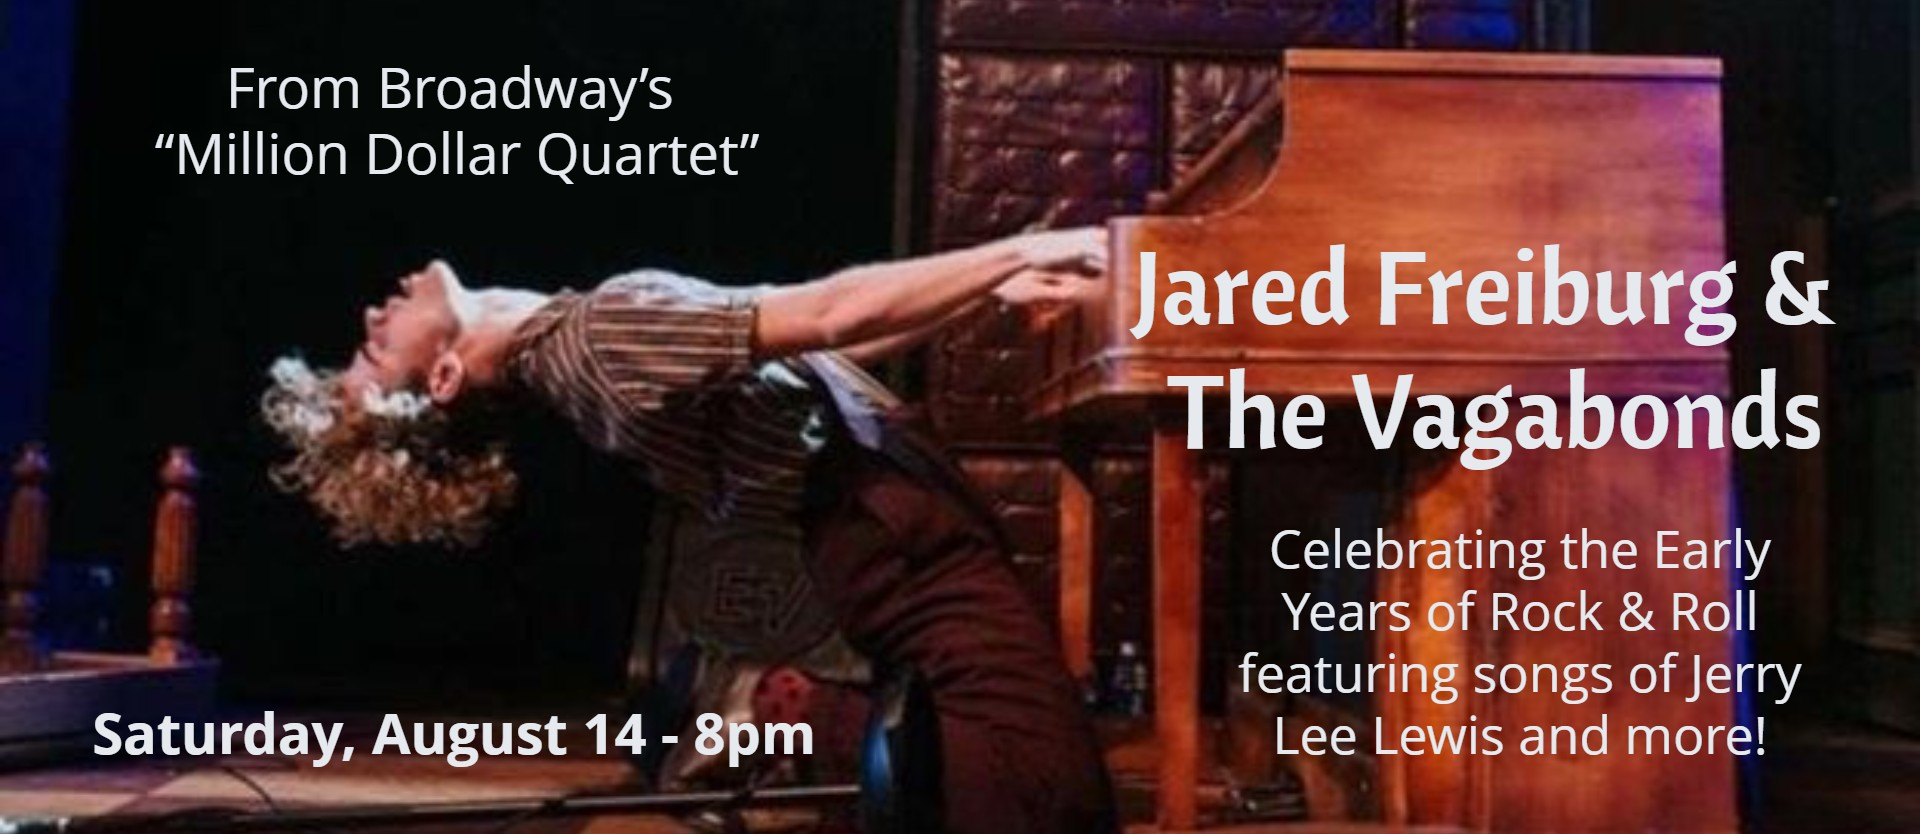 "From Broadway's ""Million Dollar Quartet"" - JARED FREIBURG & THE VAGABONDS"